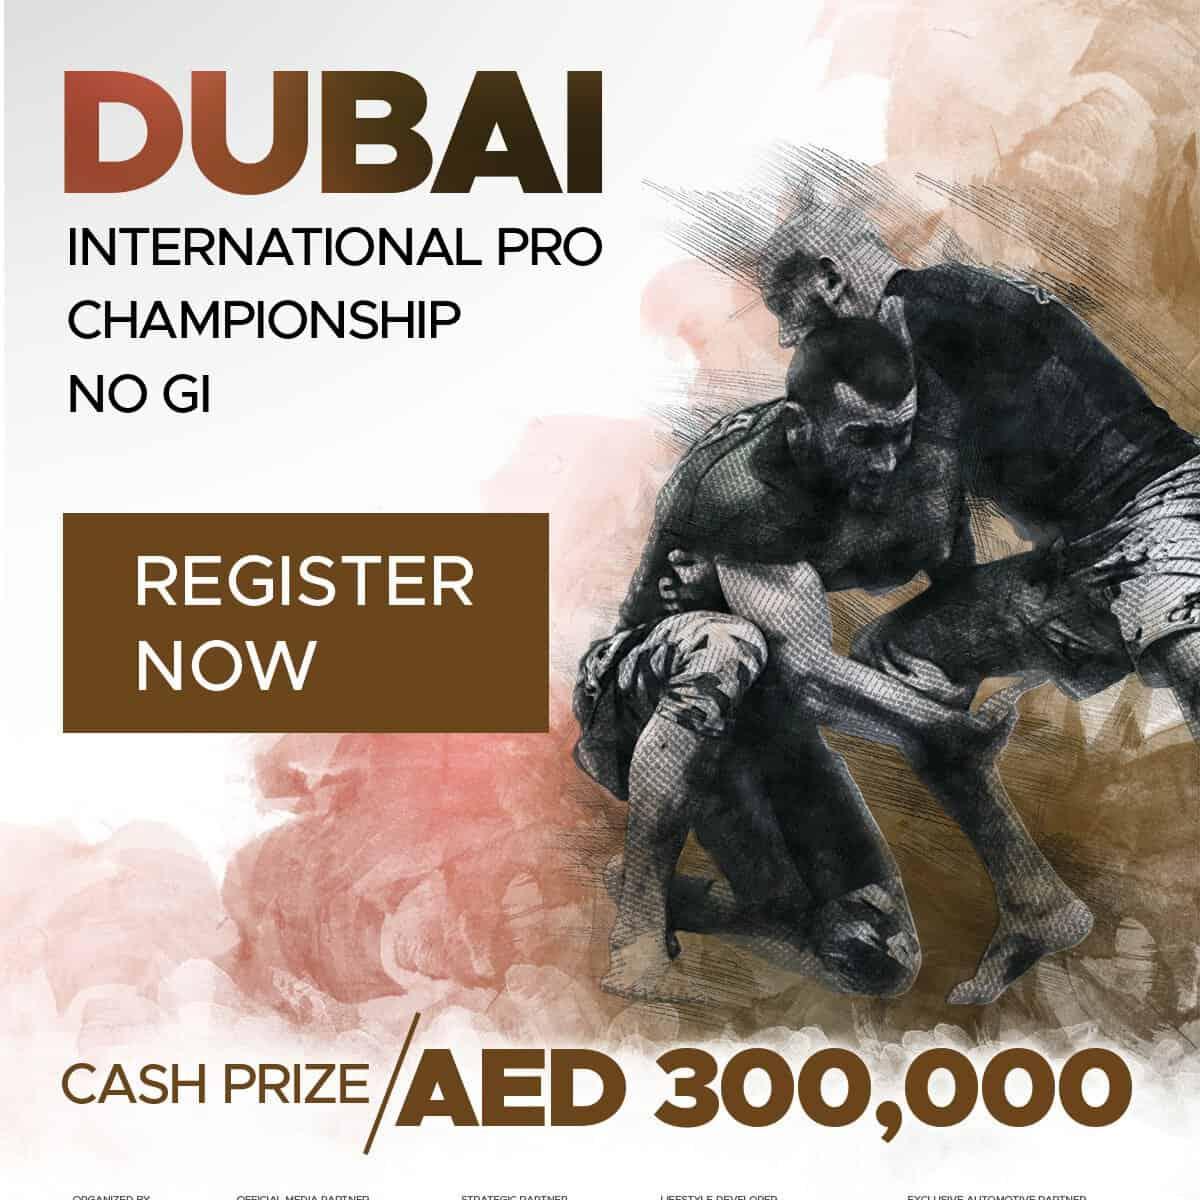 Dubai international pro championship no gi uaejjf